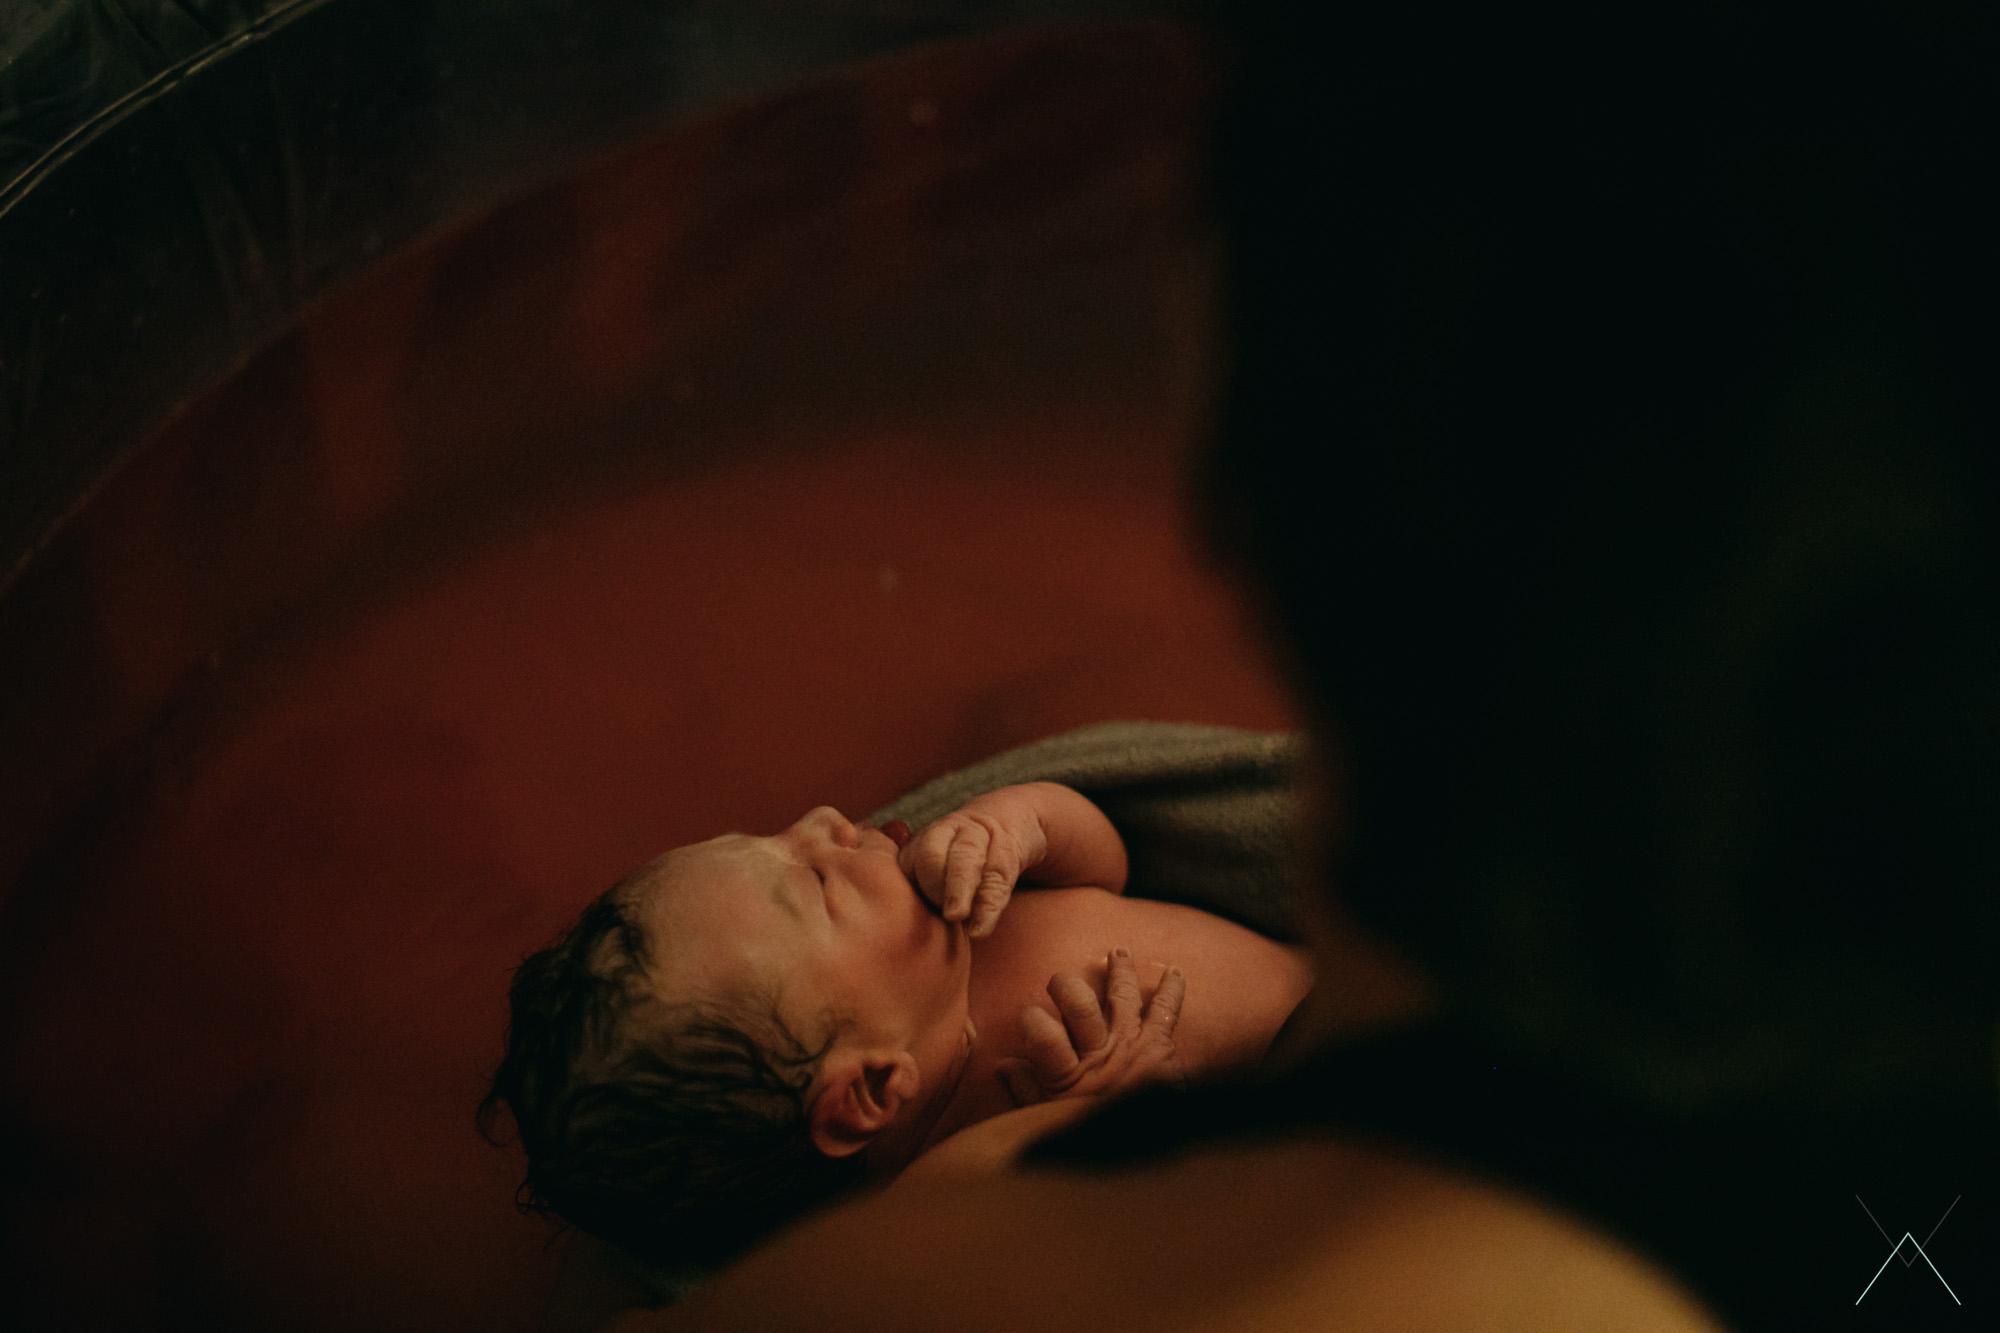 vanessa amiot photographe- accouchement a domicile - aad -photographe thonon - photographe accouchement